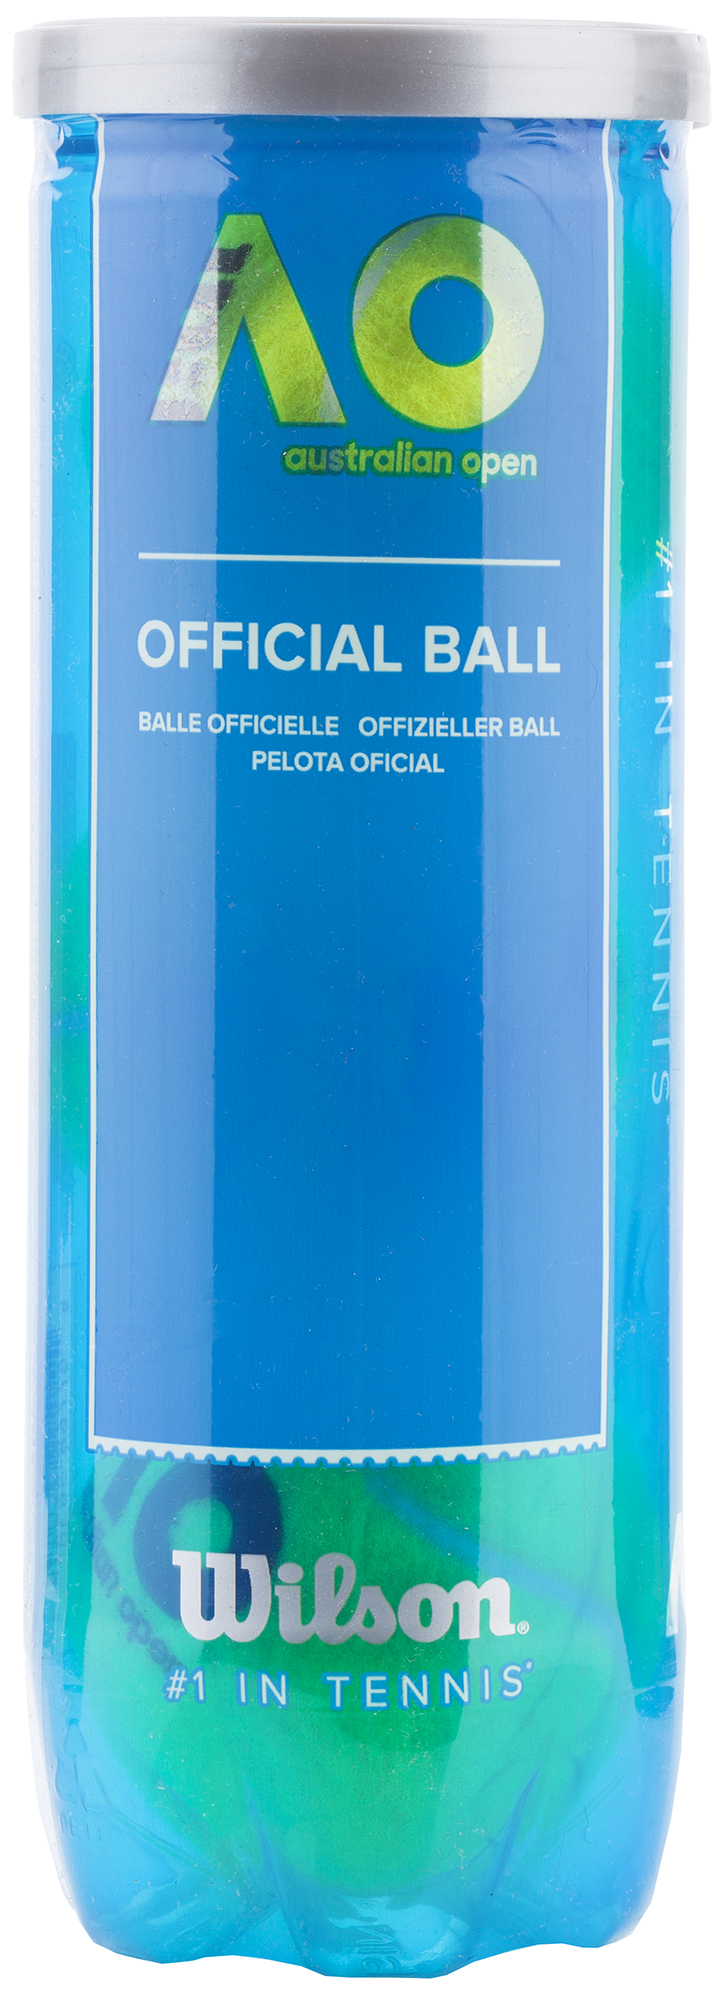 Wilson Набор мячей для большого тенниса Wilson AUSTRALIAN OPEN 3 BALL CAN demeter теннисный мяч tennis ball объем 30 мл